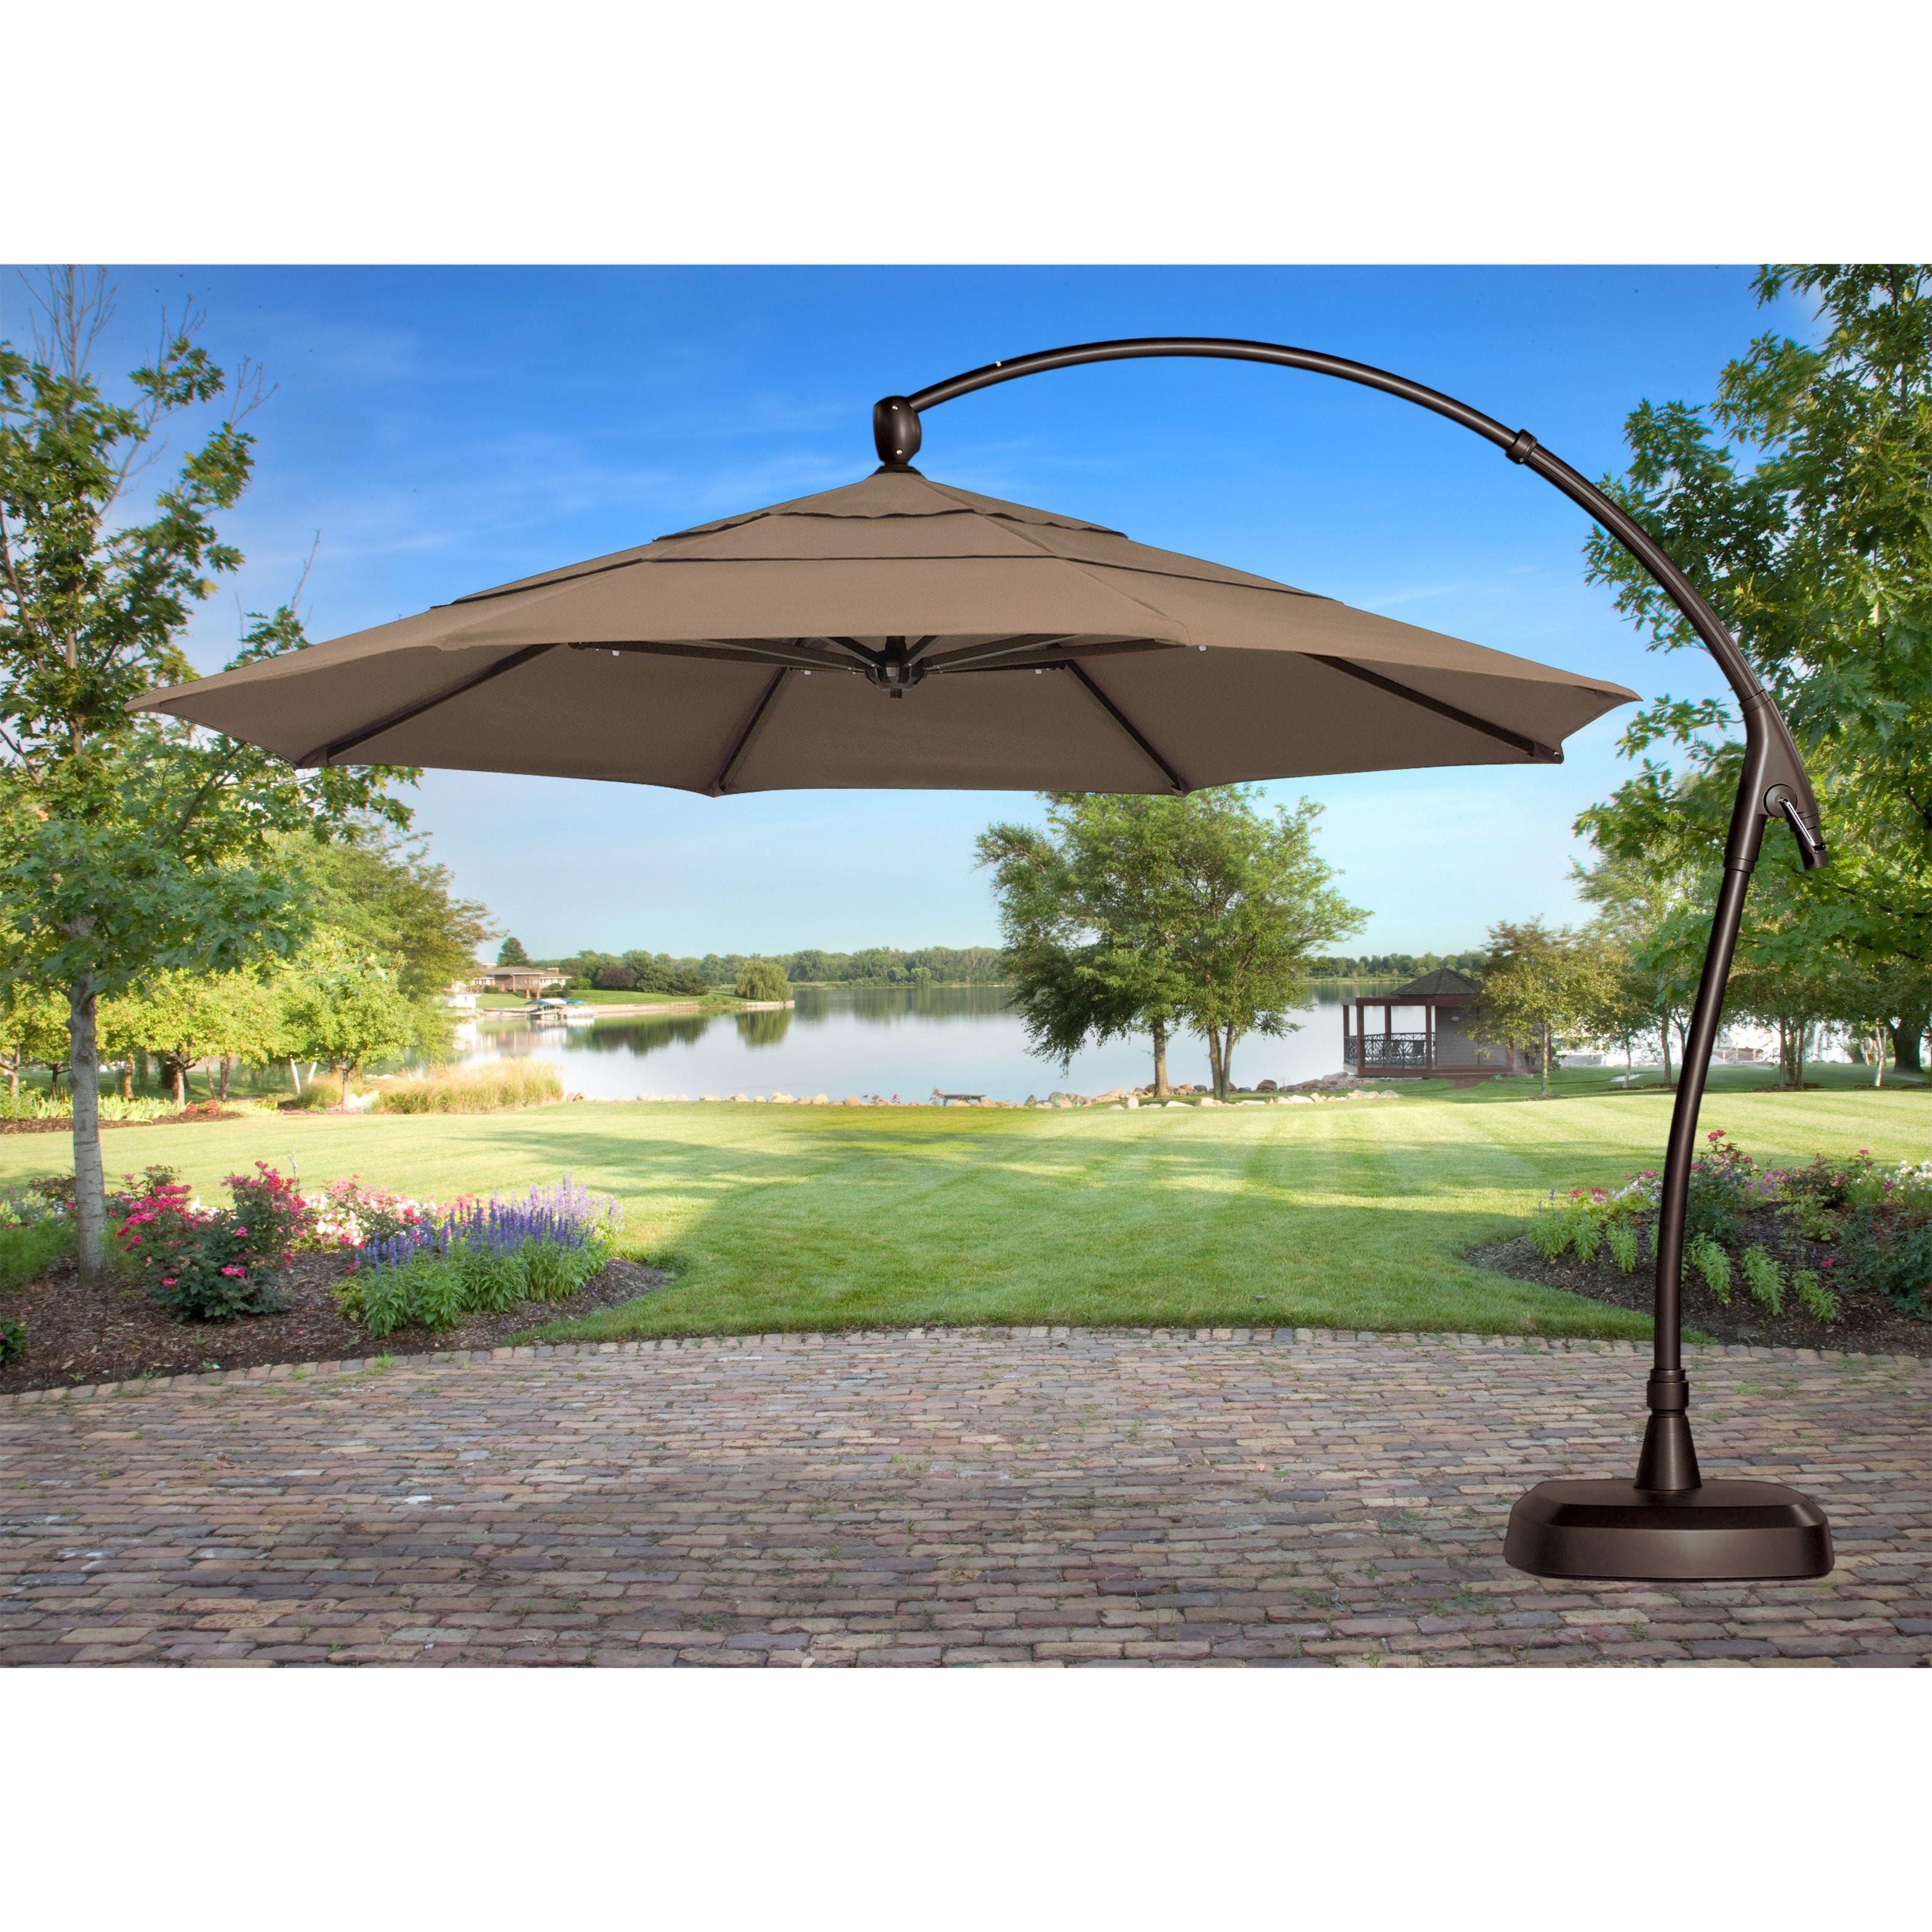 Preferred Sunbrella Black Patio Umbrellas Regarding Patio Umbrella Sale Sunbrella 33 In Stylish Home Designing Ideas (View 10 of 20)